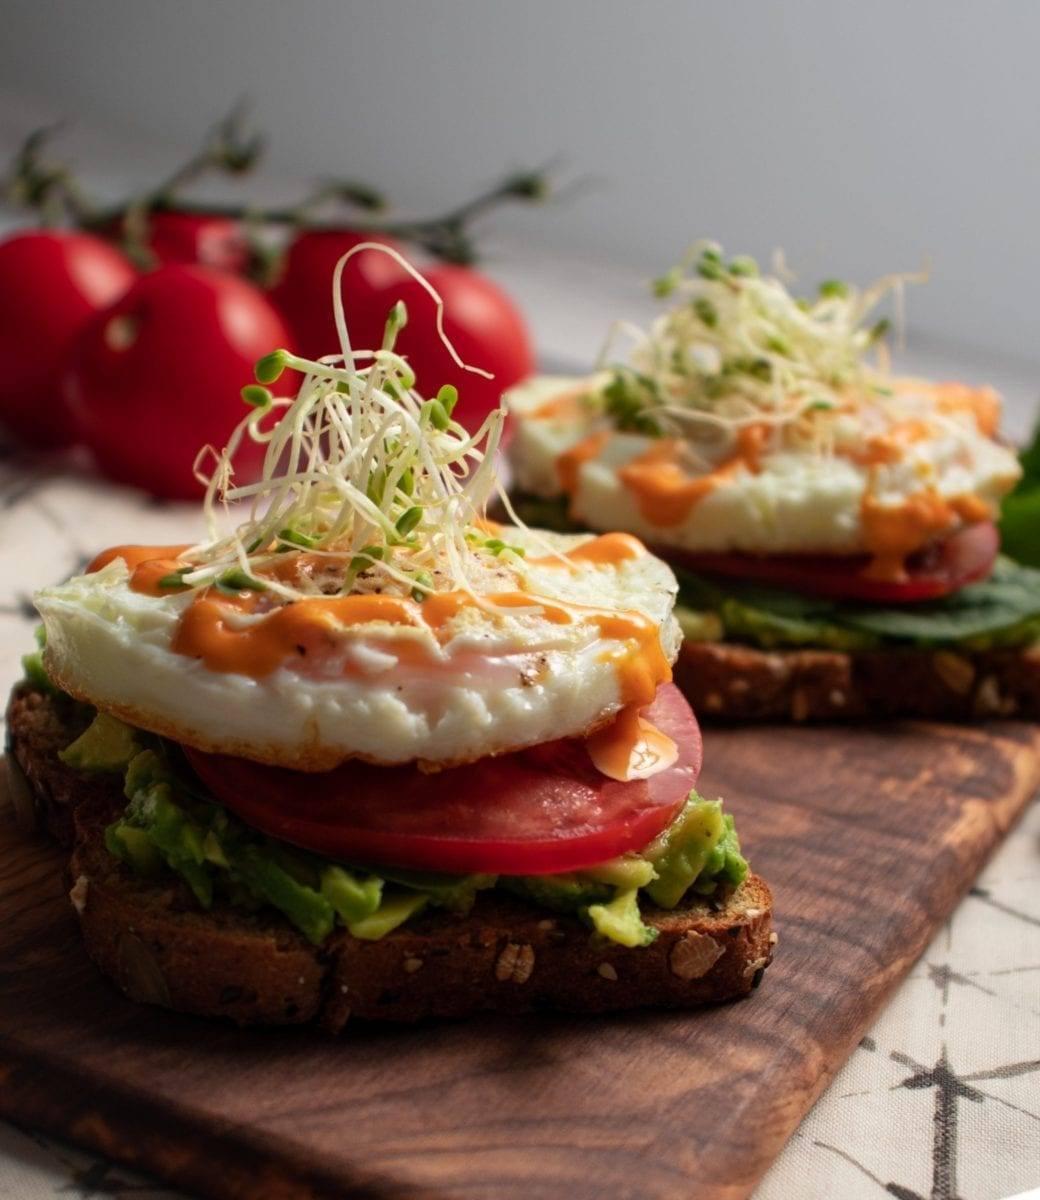 Simple Egg & Avocado Toast